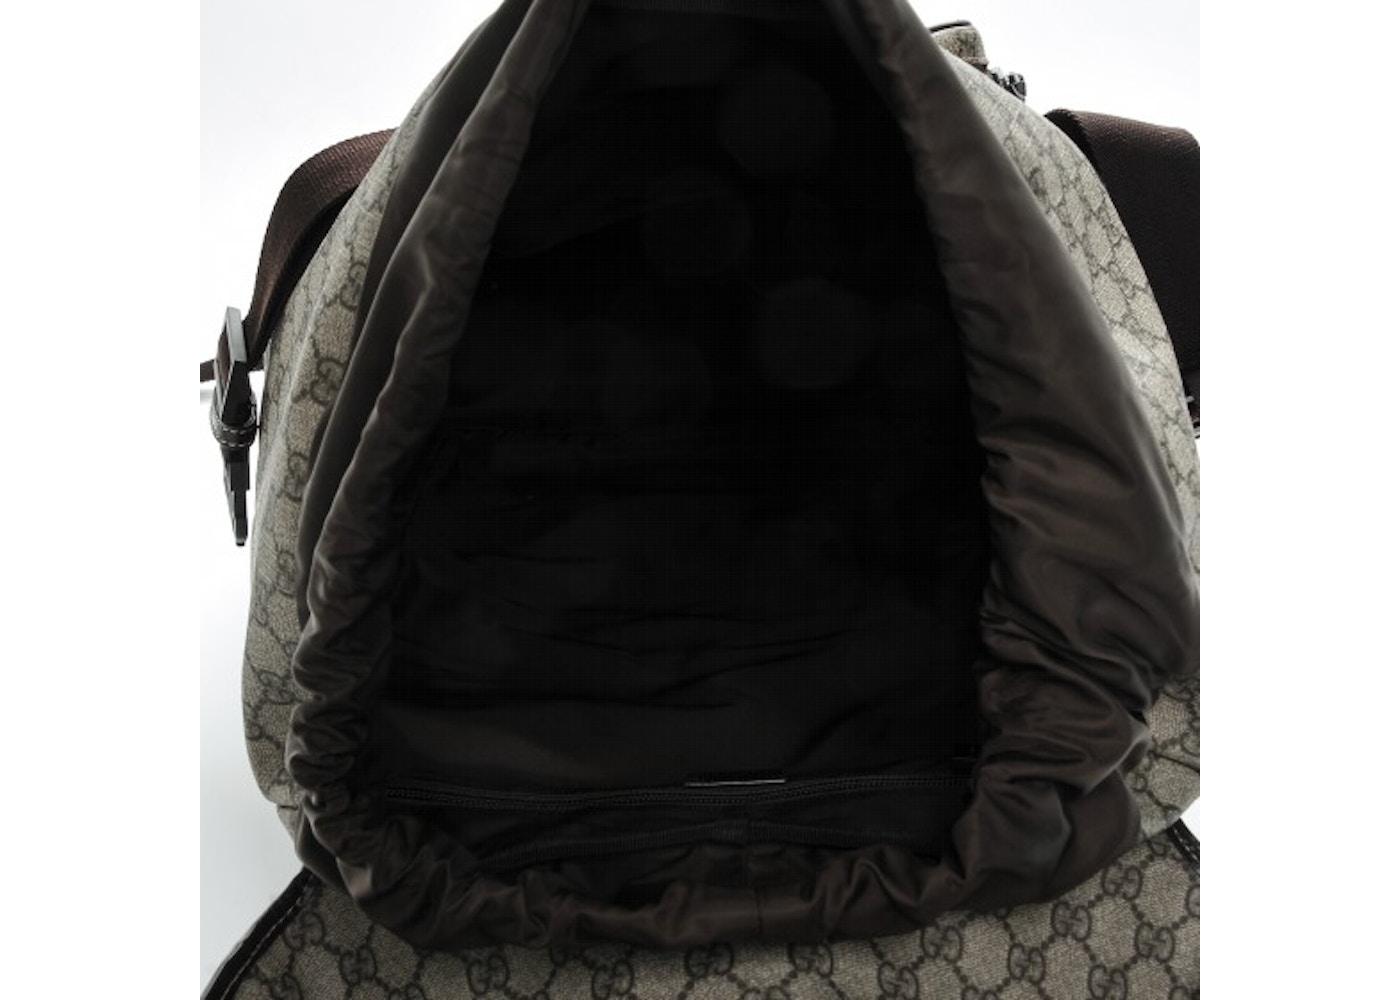 d06a4d717 Gg Supreme Canvas Interlocking G Backpack Black- Fenix Toulouse Handball